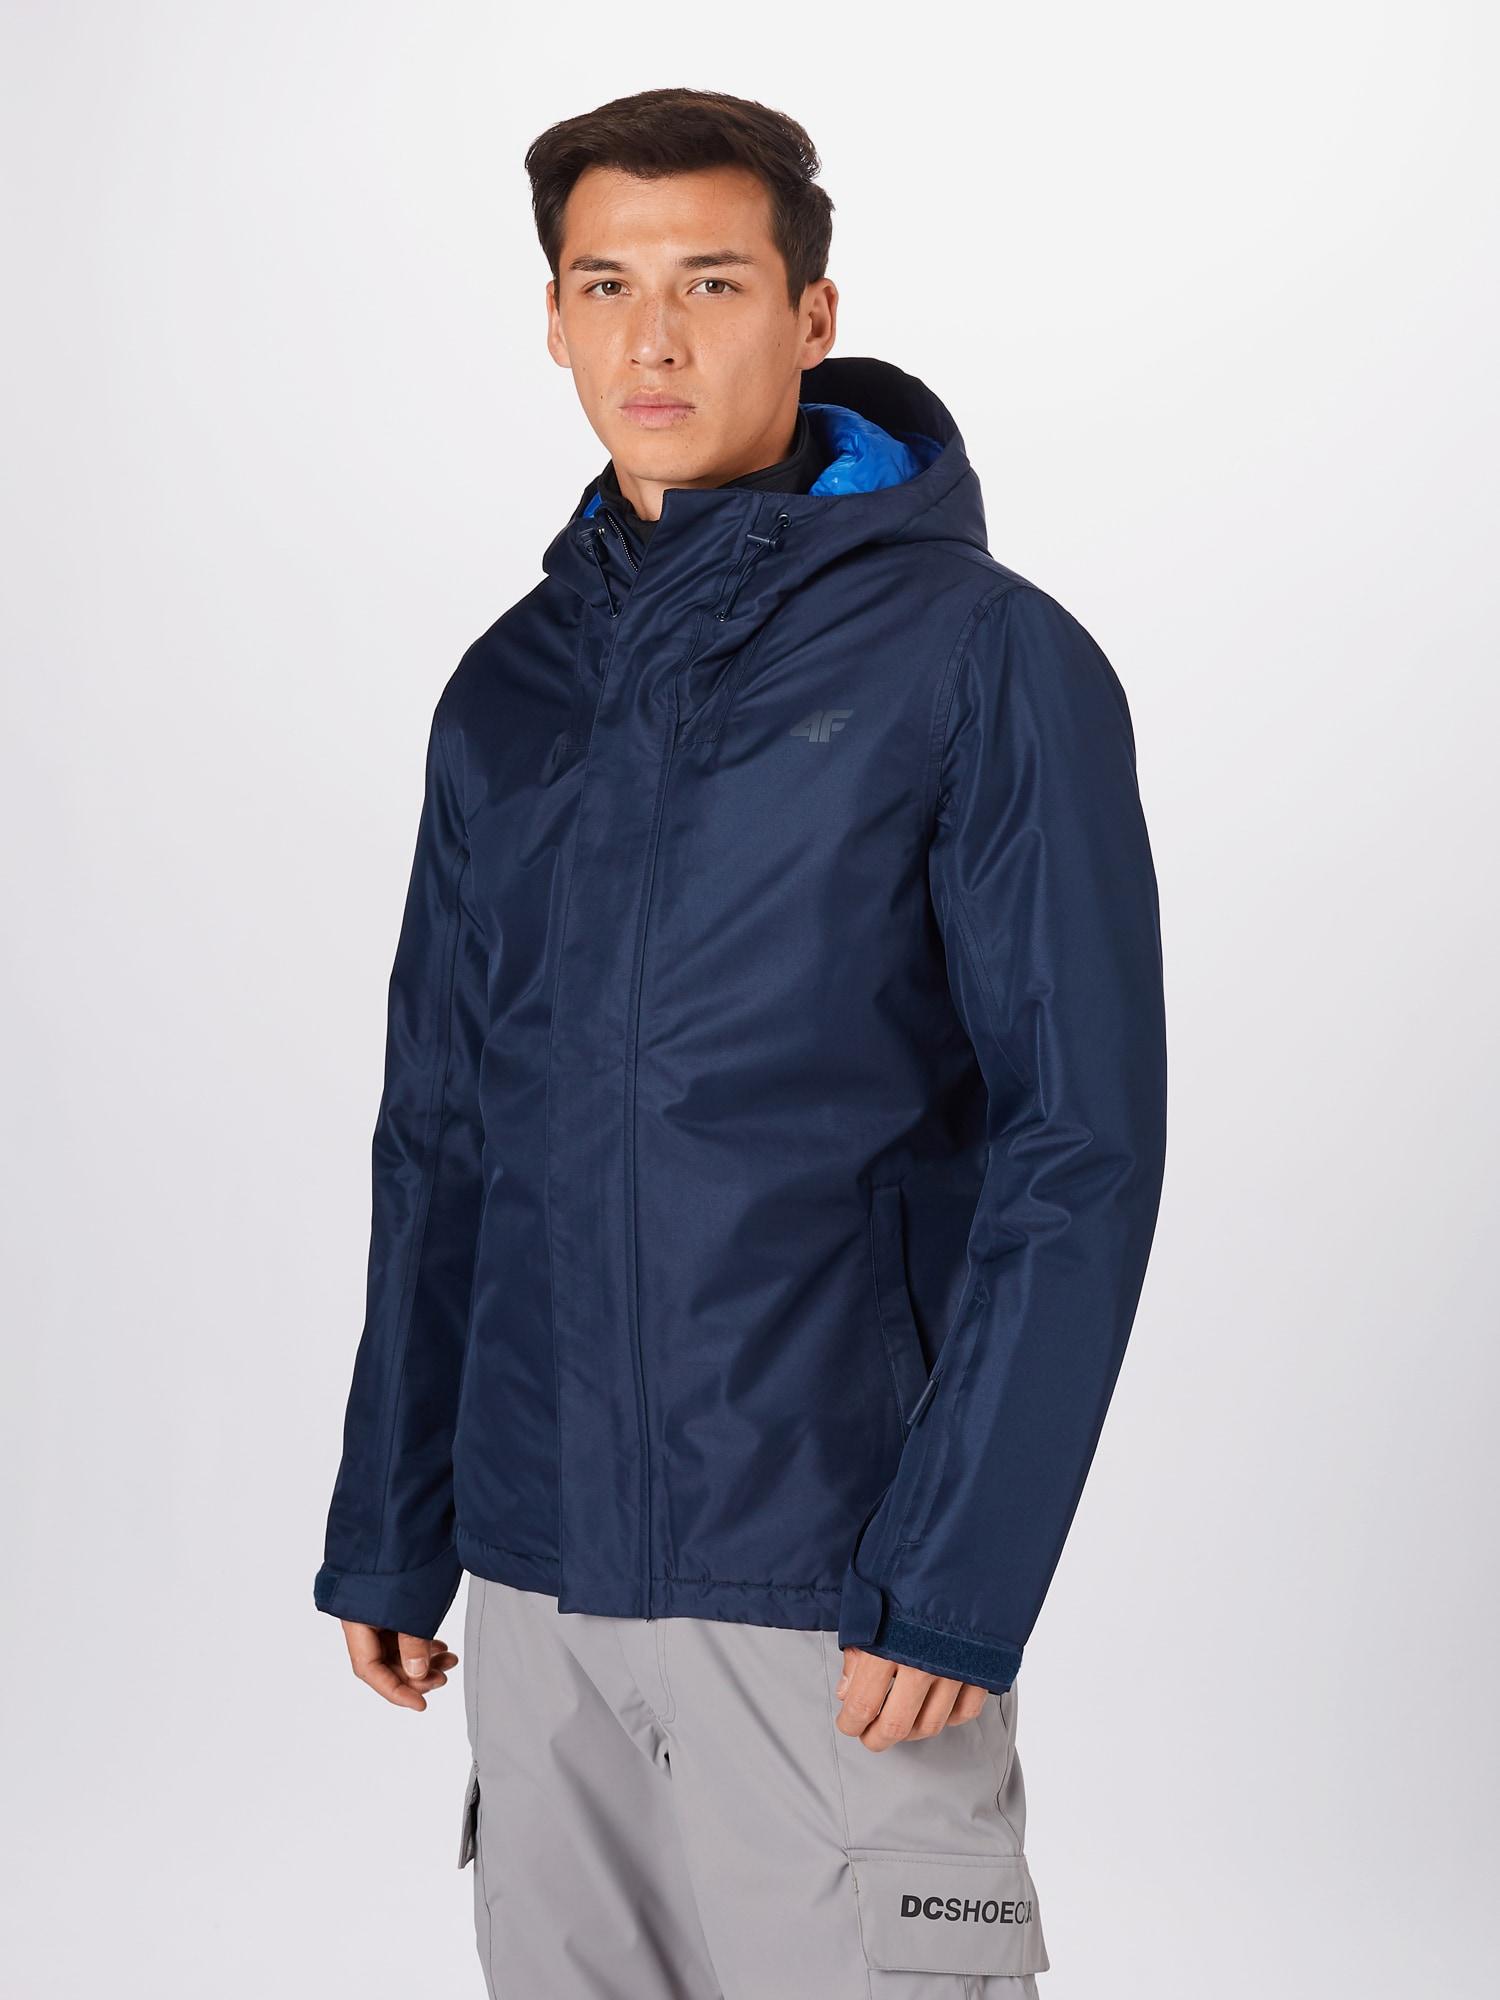 4F Sportjacka  marinblå